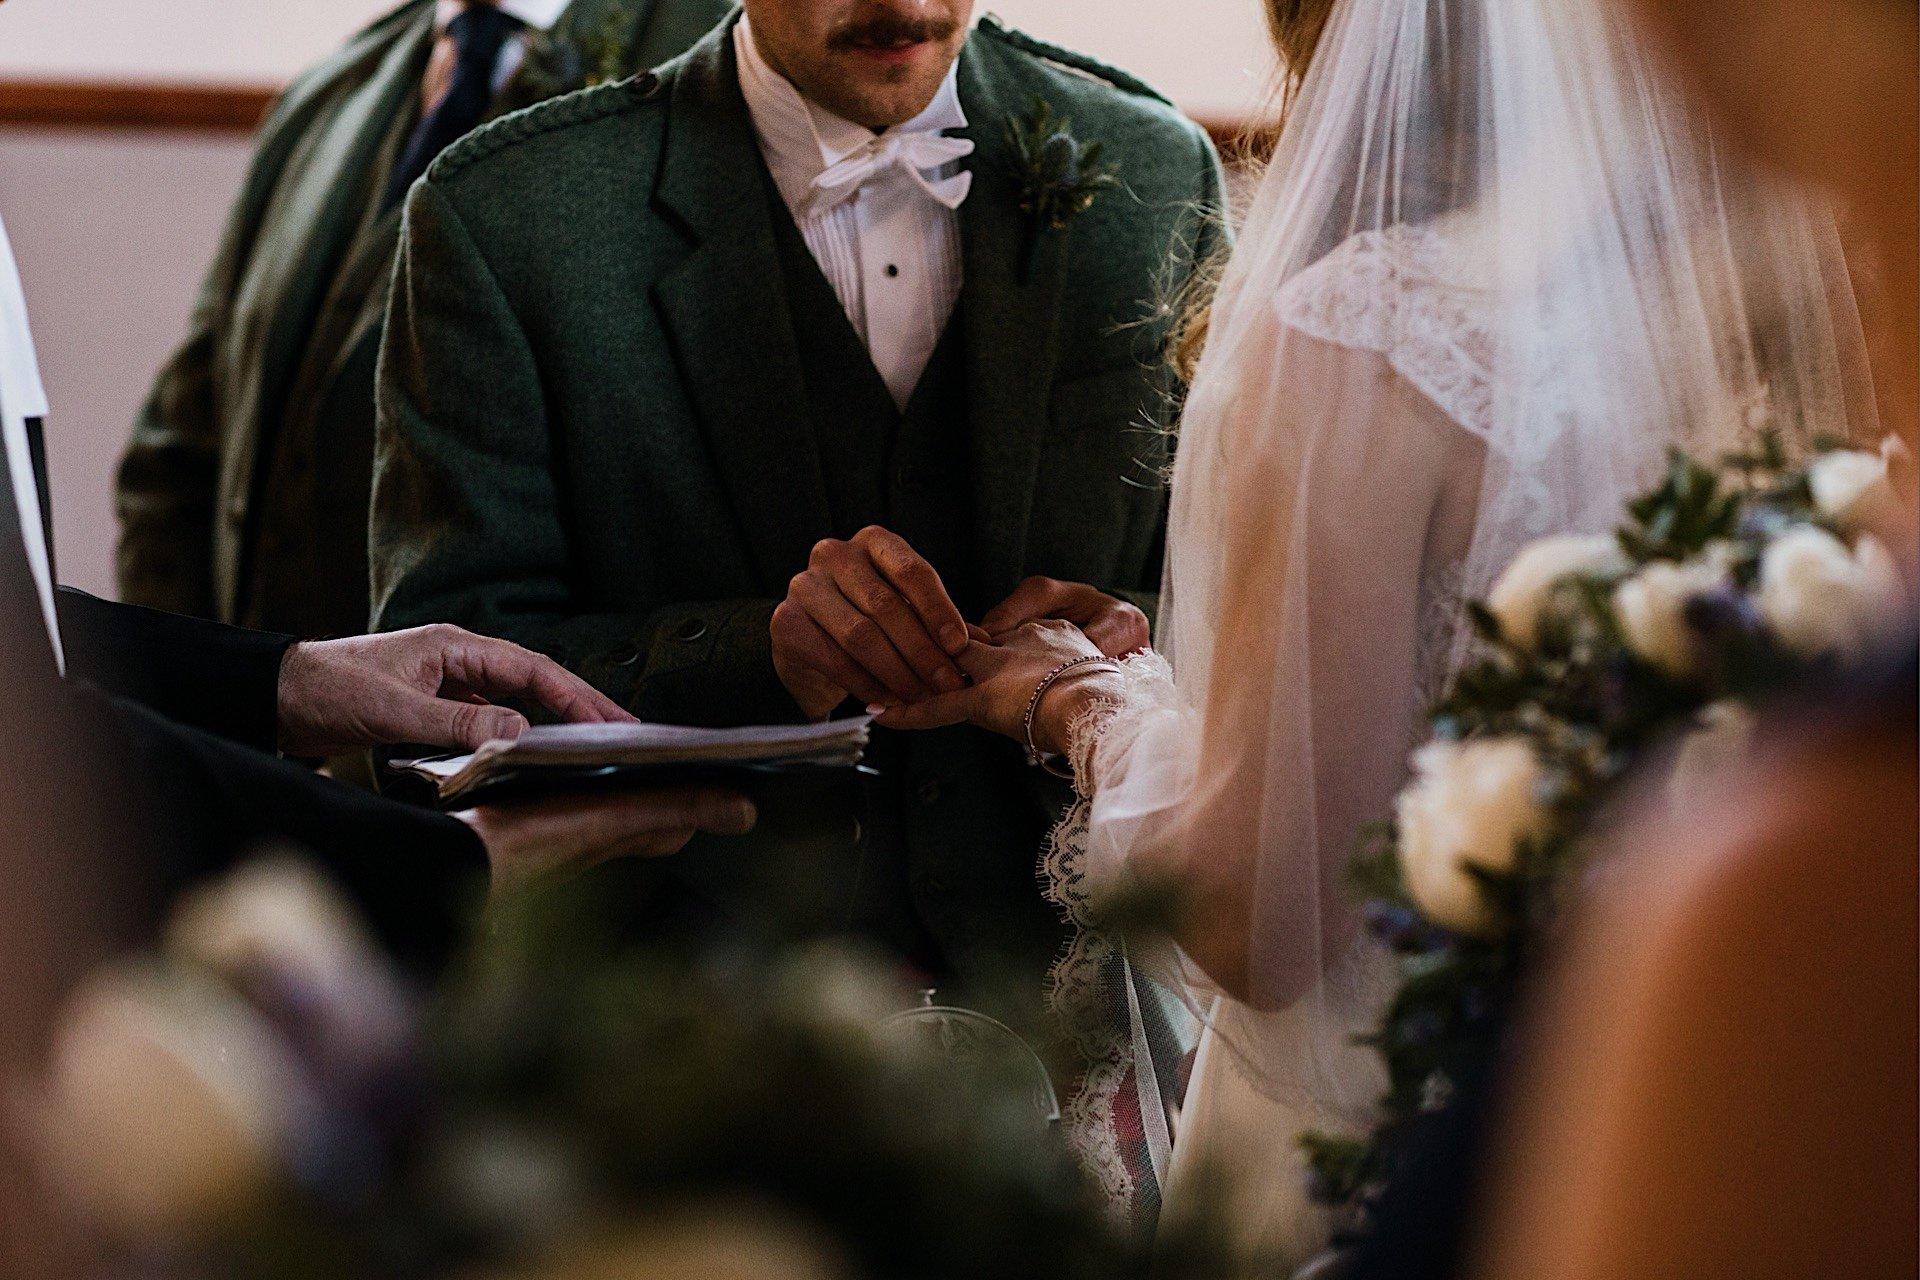 puttting hand Ring groom on brides